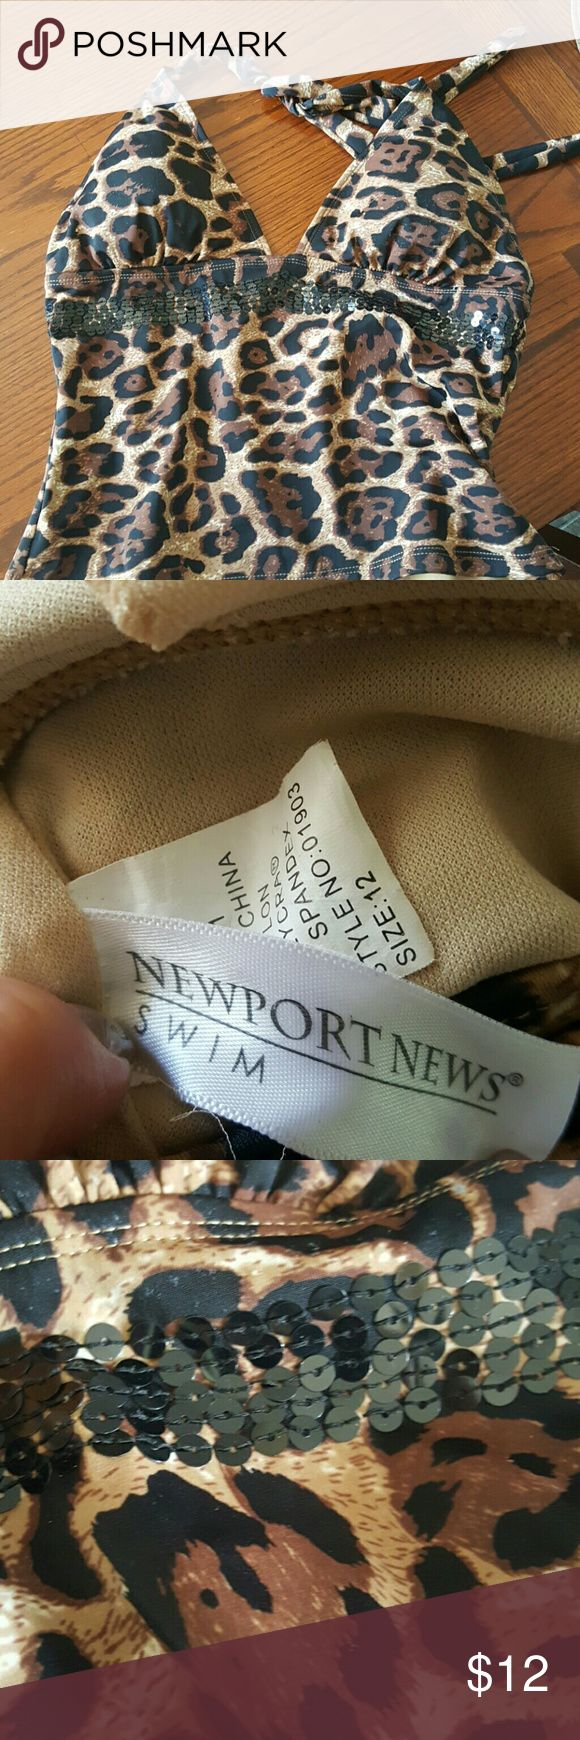 Tankini top Newport News leopard print tankini top very good quality.  I wore them with basic black bottoms Newport News Swim